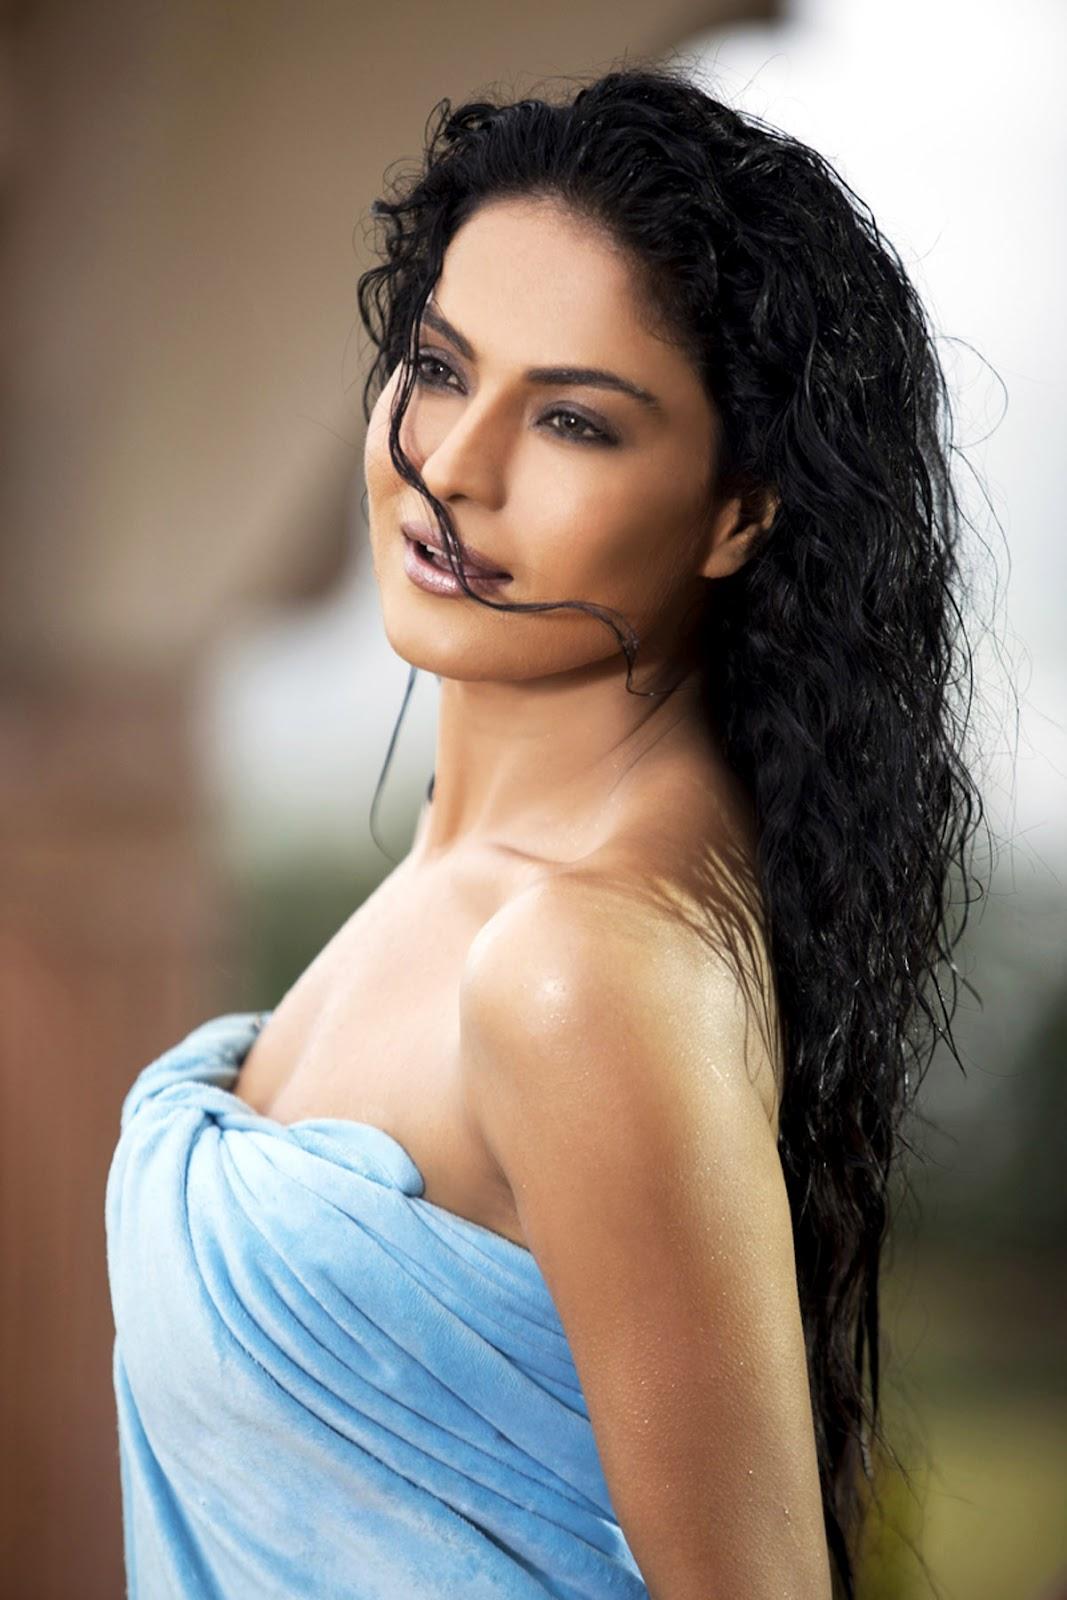 Hot In Water : Bollywood spicy girl veena malik hot towel expose cleavage